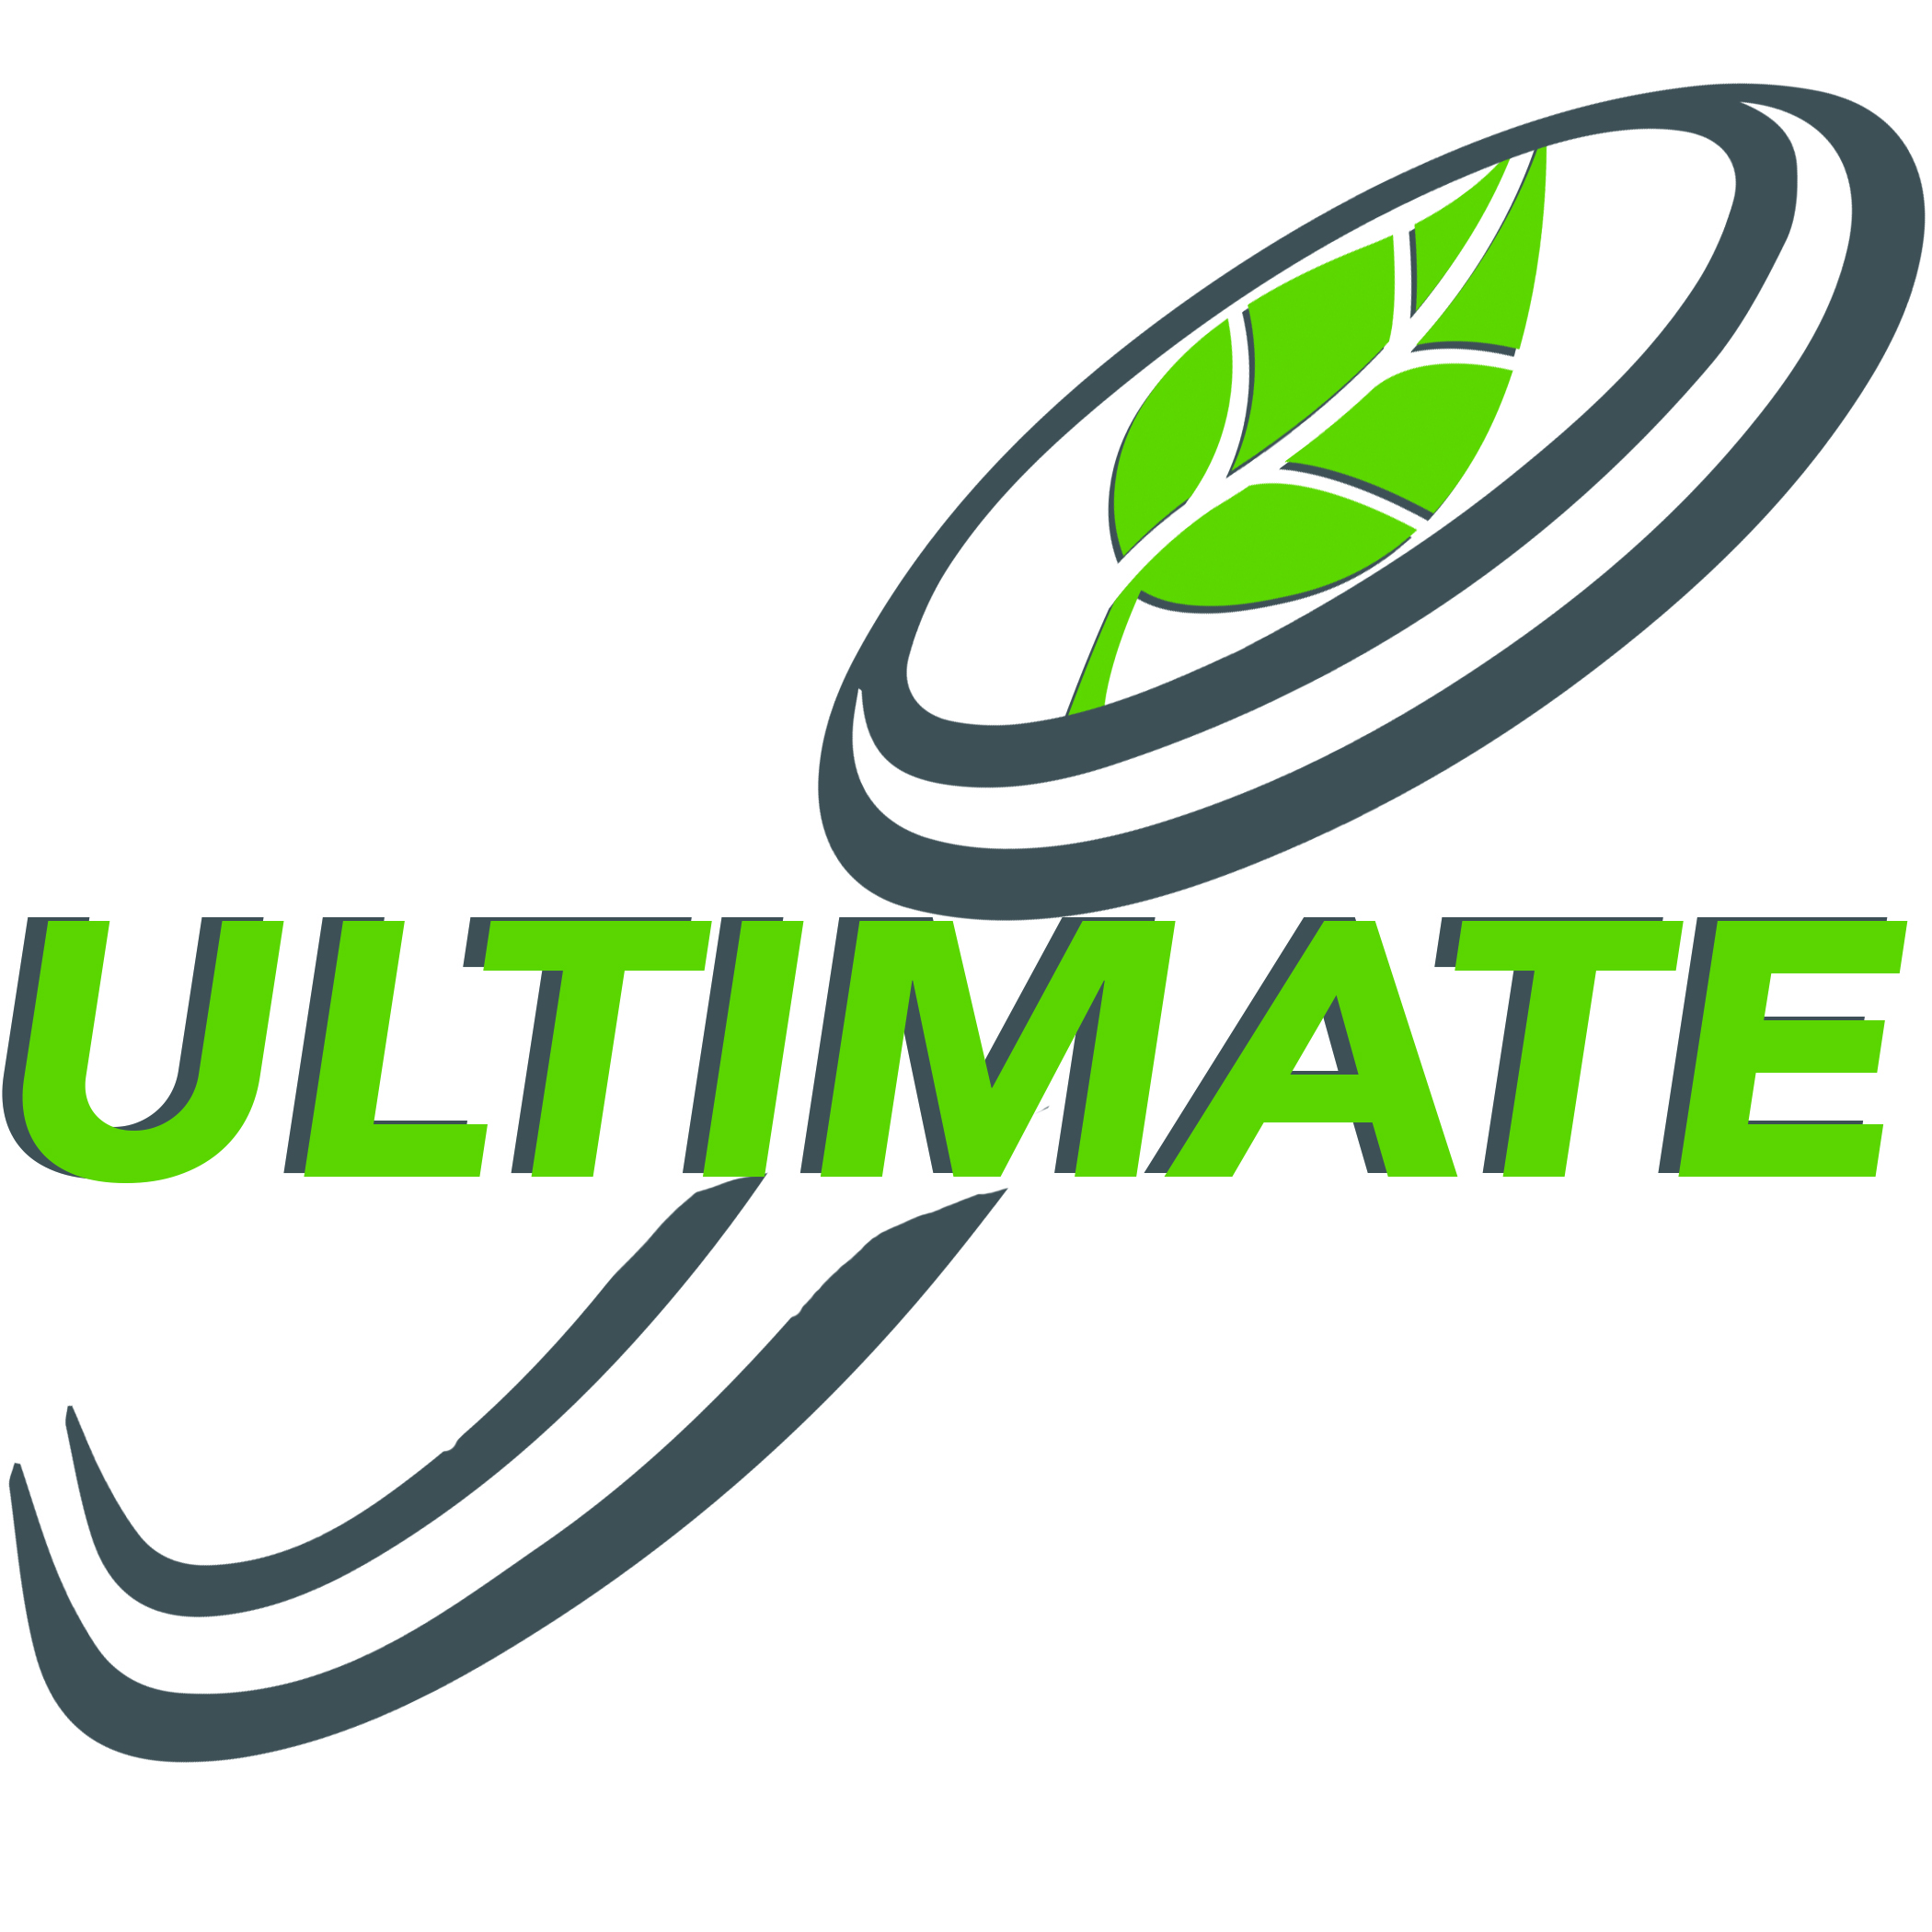 UltimateDiscWeb.jpg